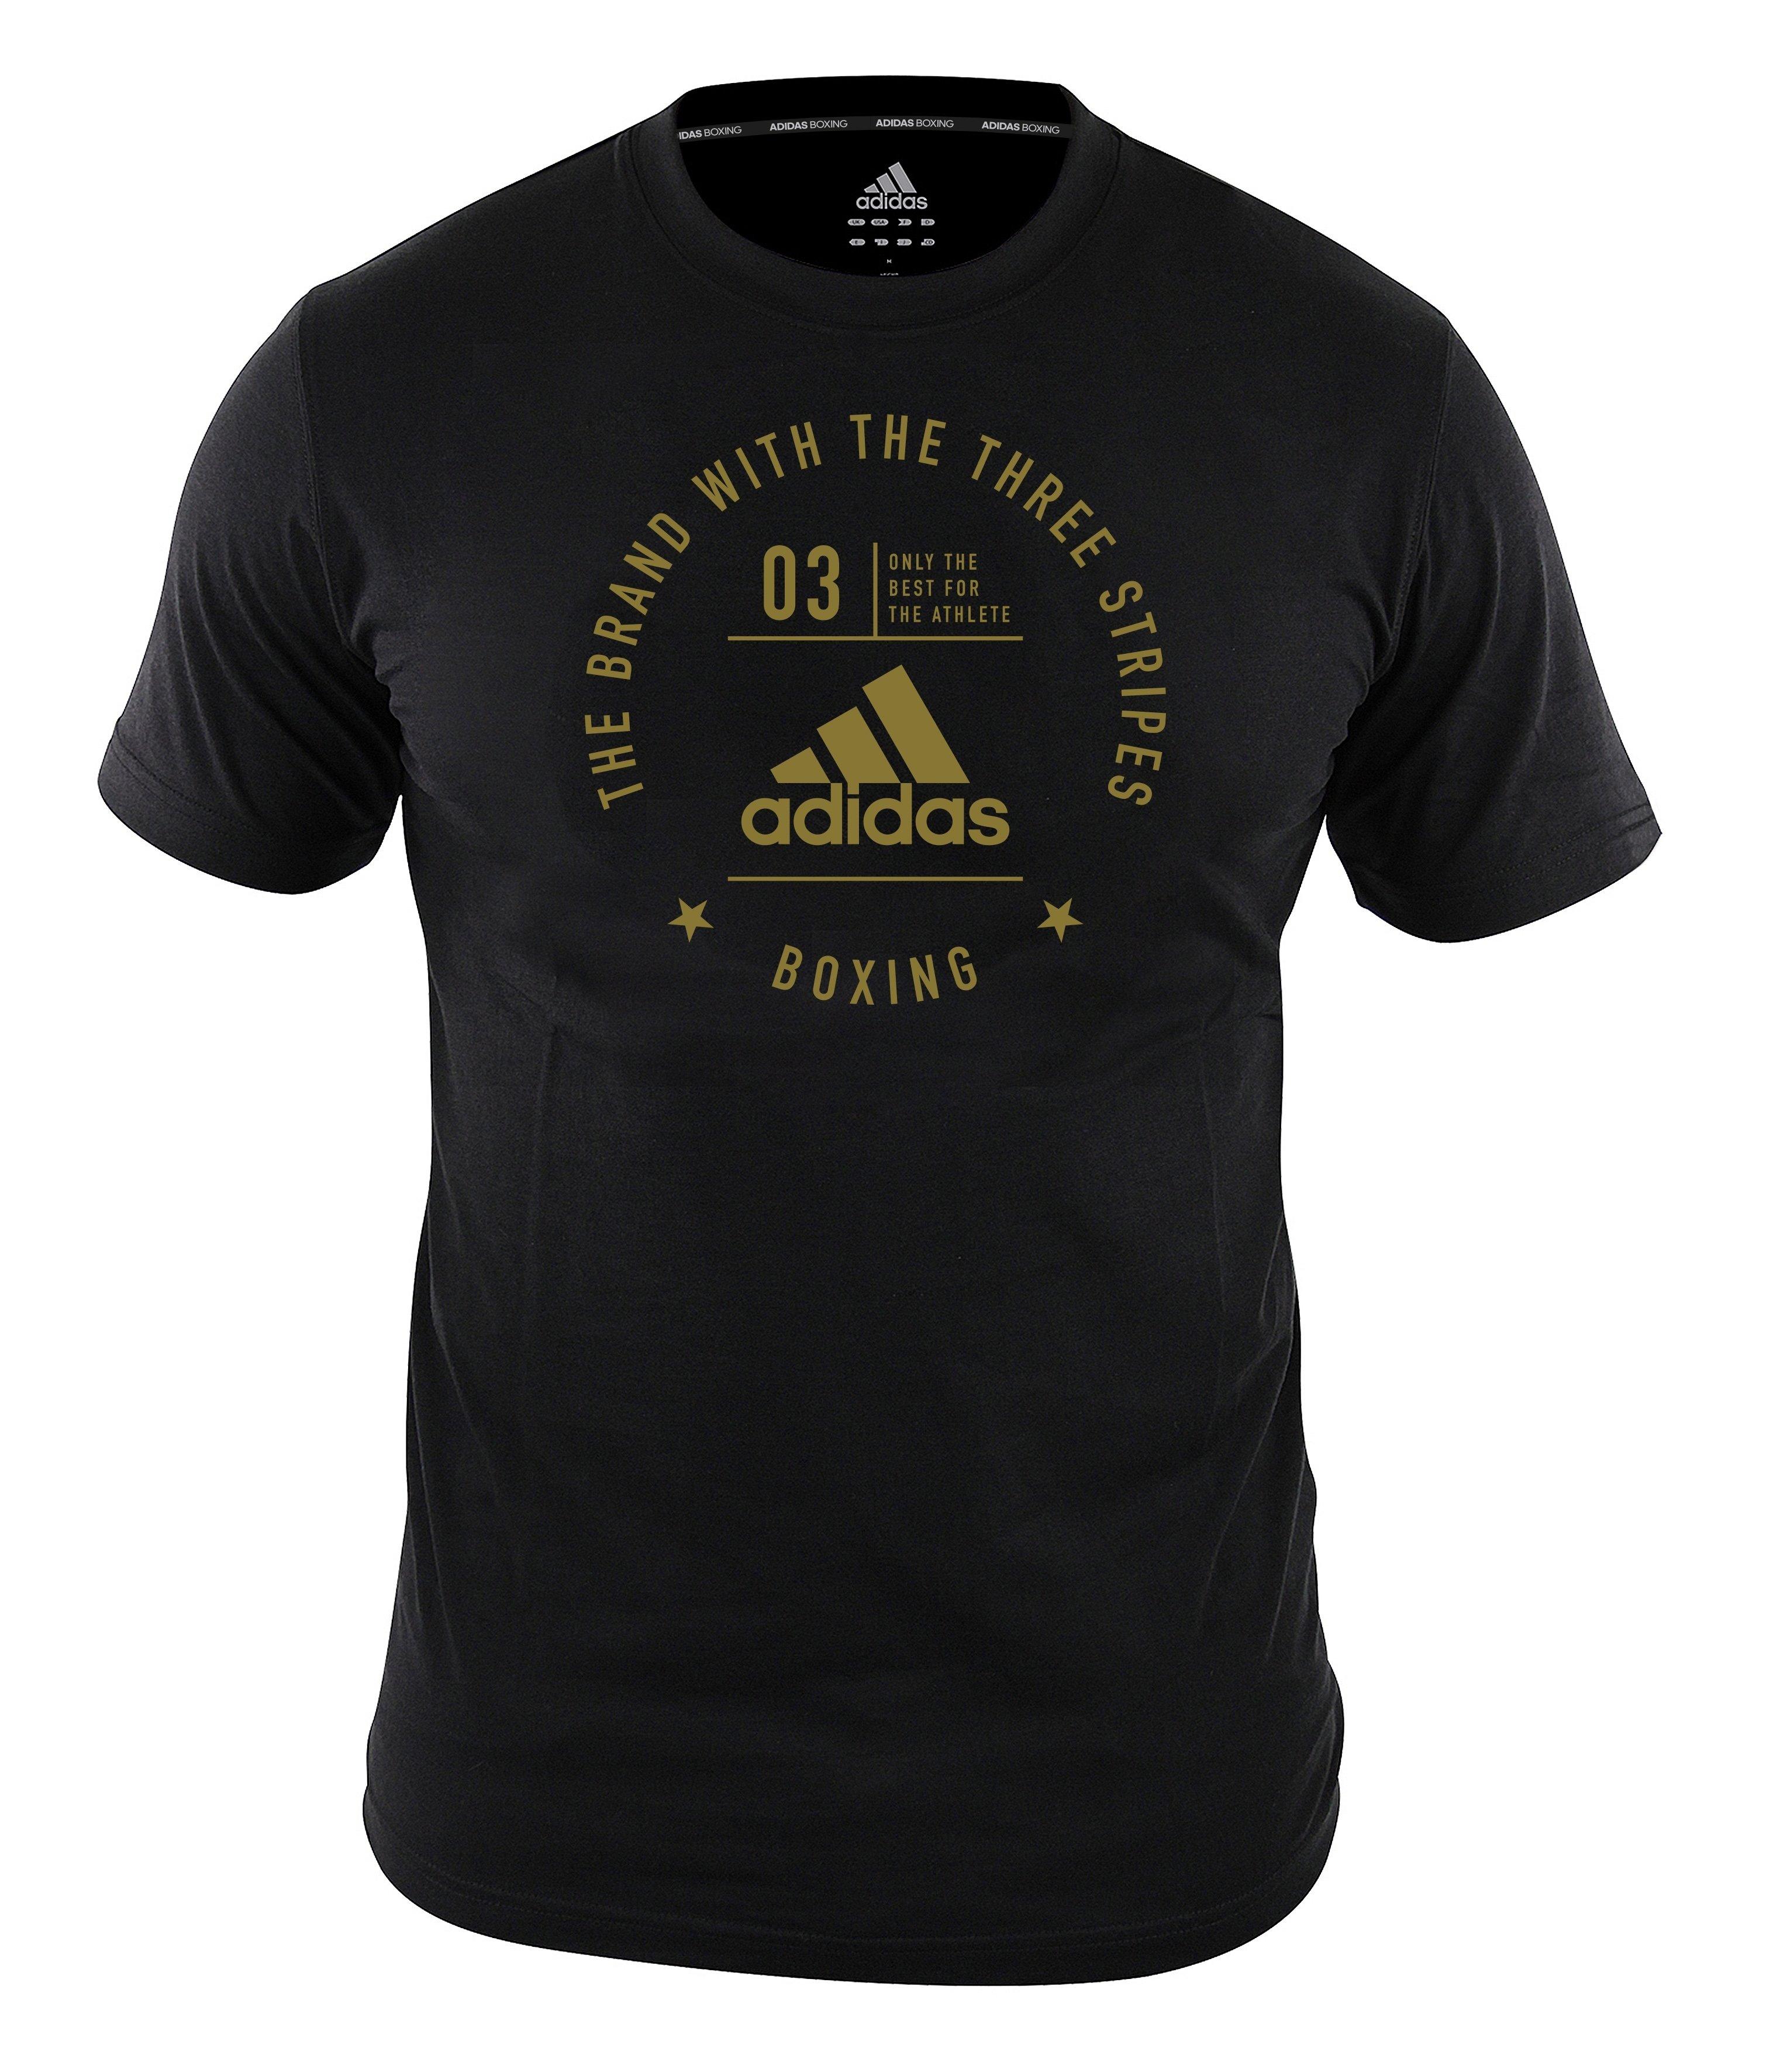 adidas t shirt uk